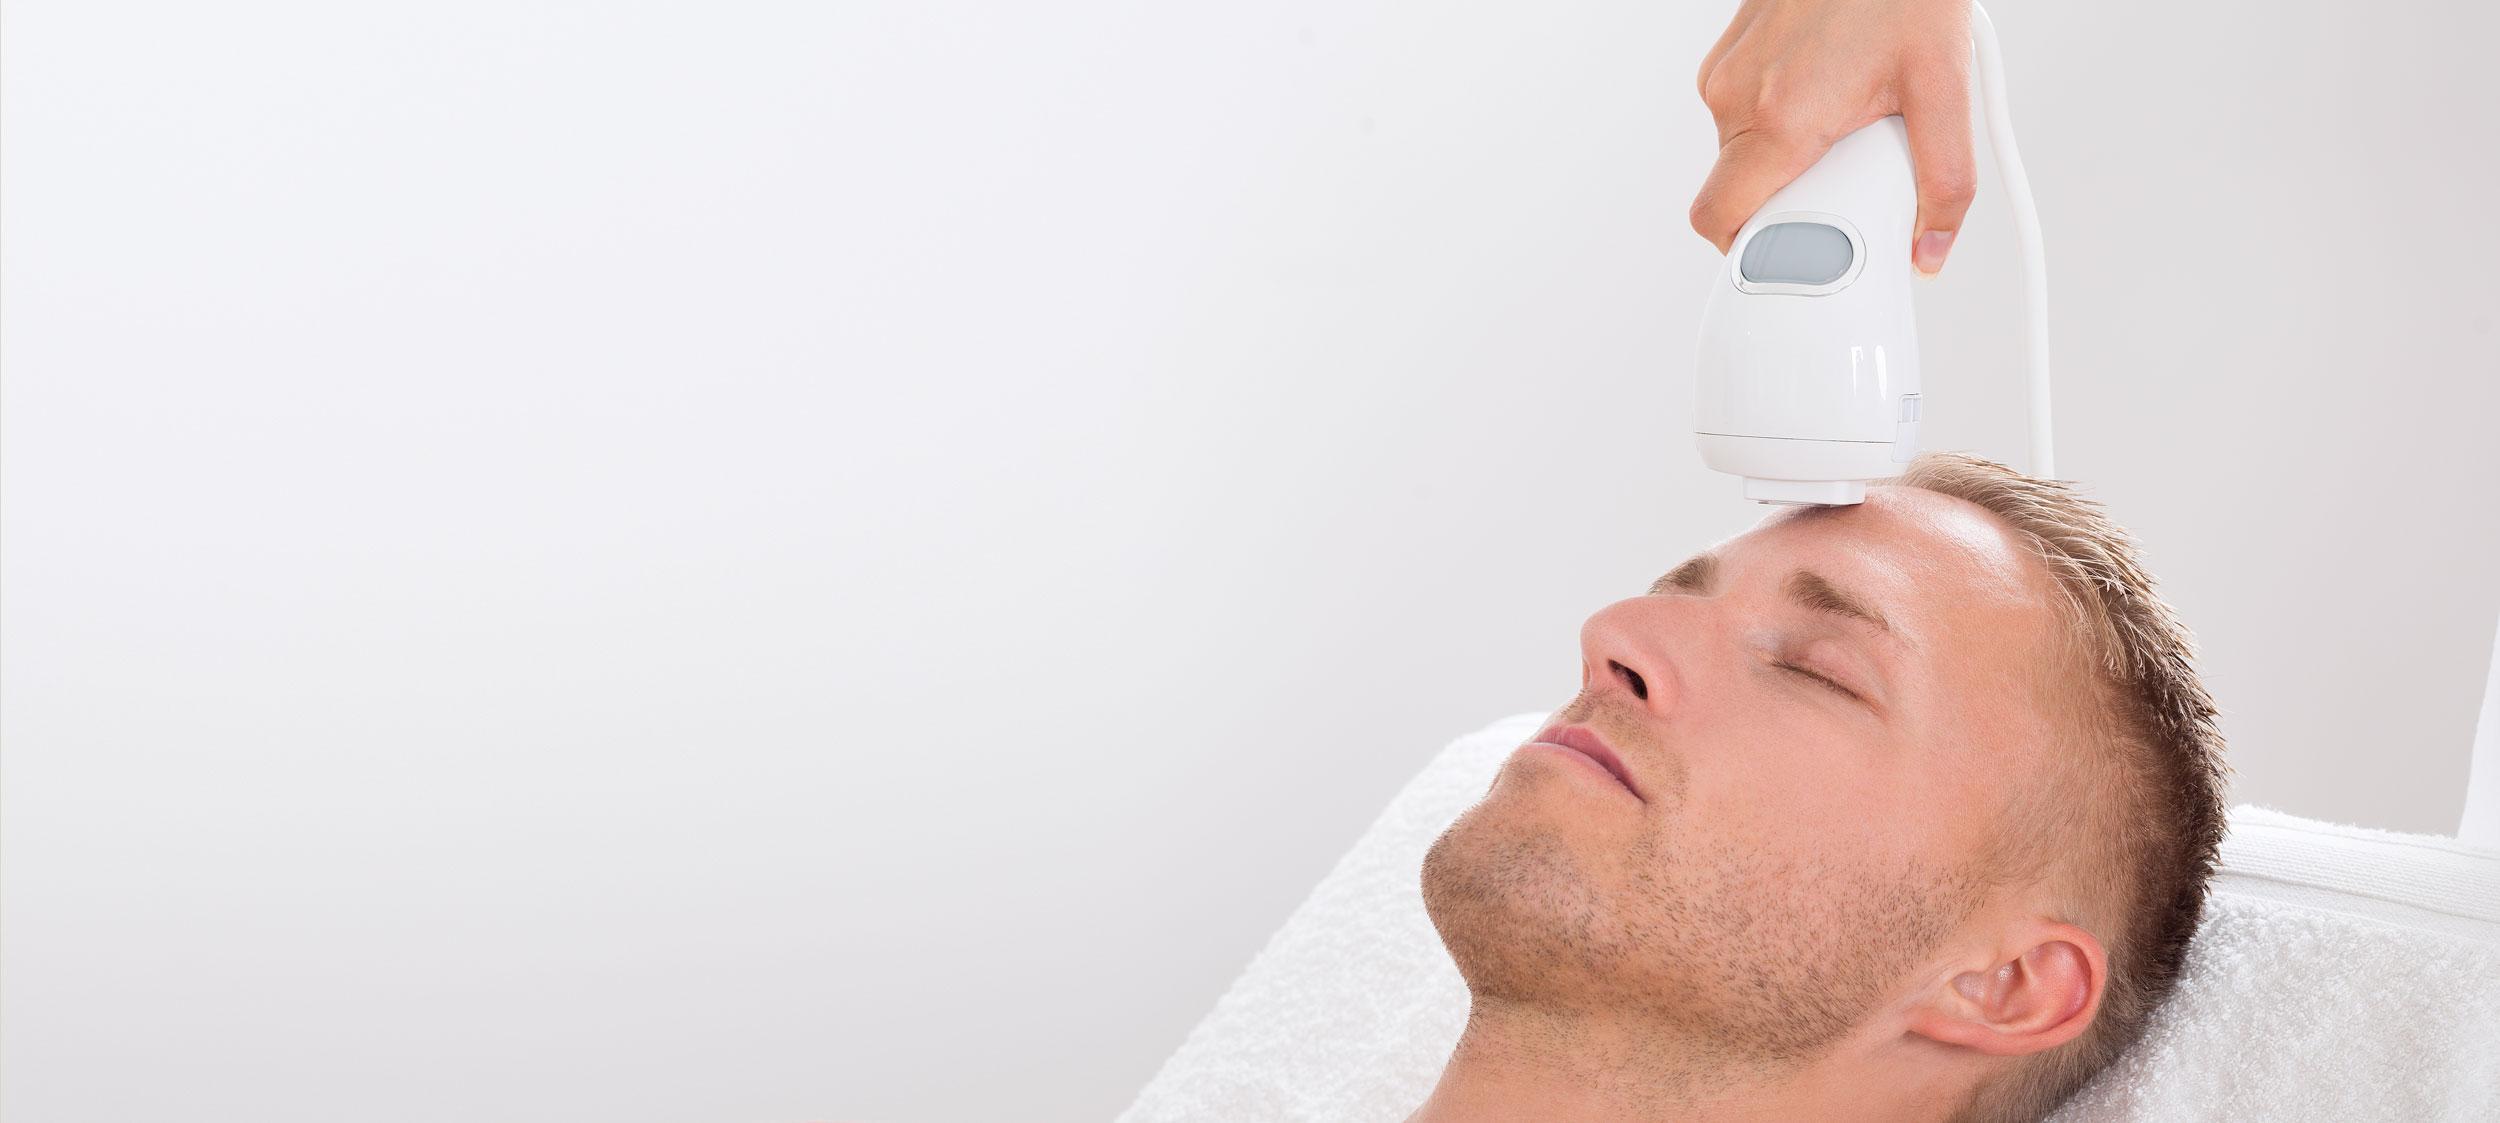 laserbehandling i ansiktet på man